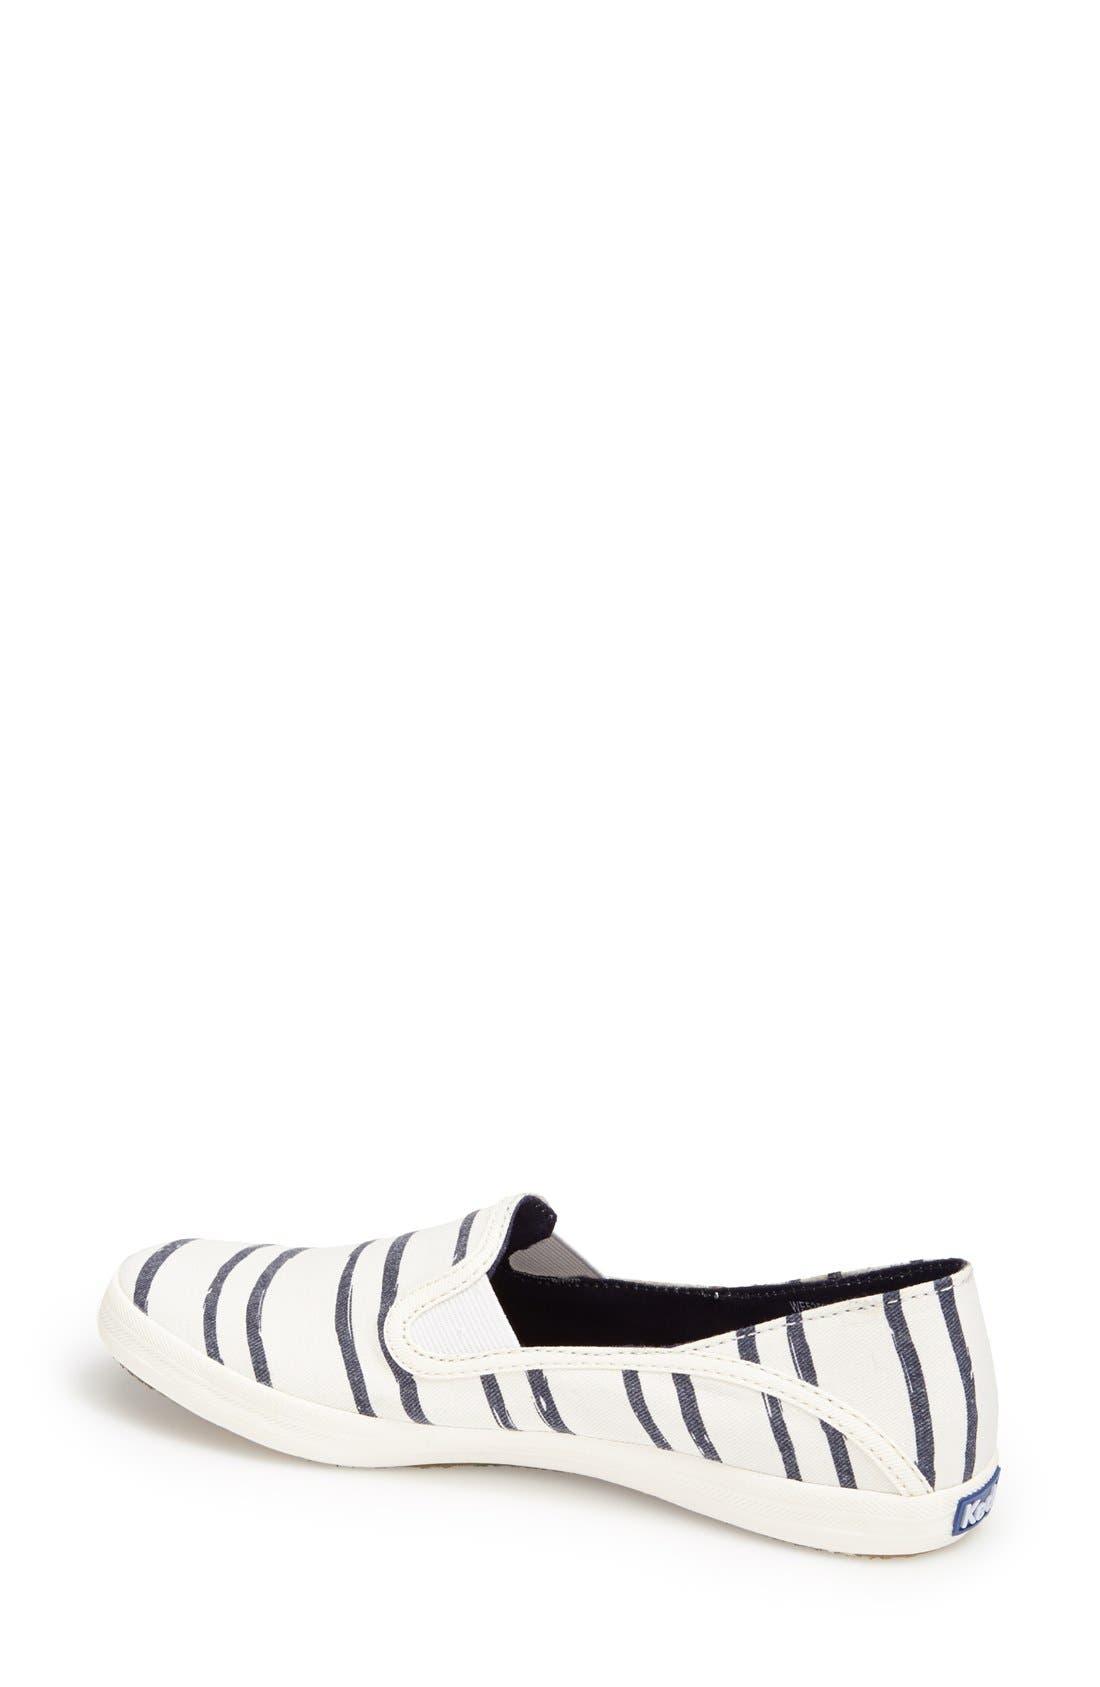 Alternate Image 2  - Keds® 'Crashback - Washed Beach Stripe' Slip-On Sneaker (Women)